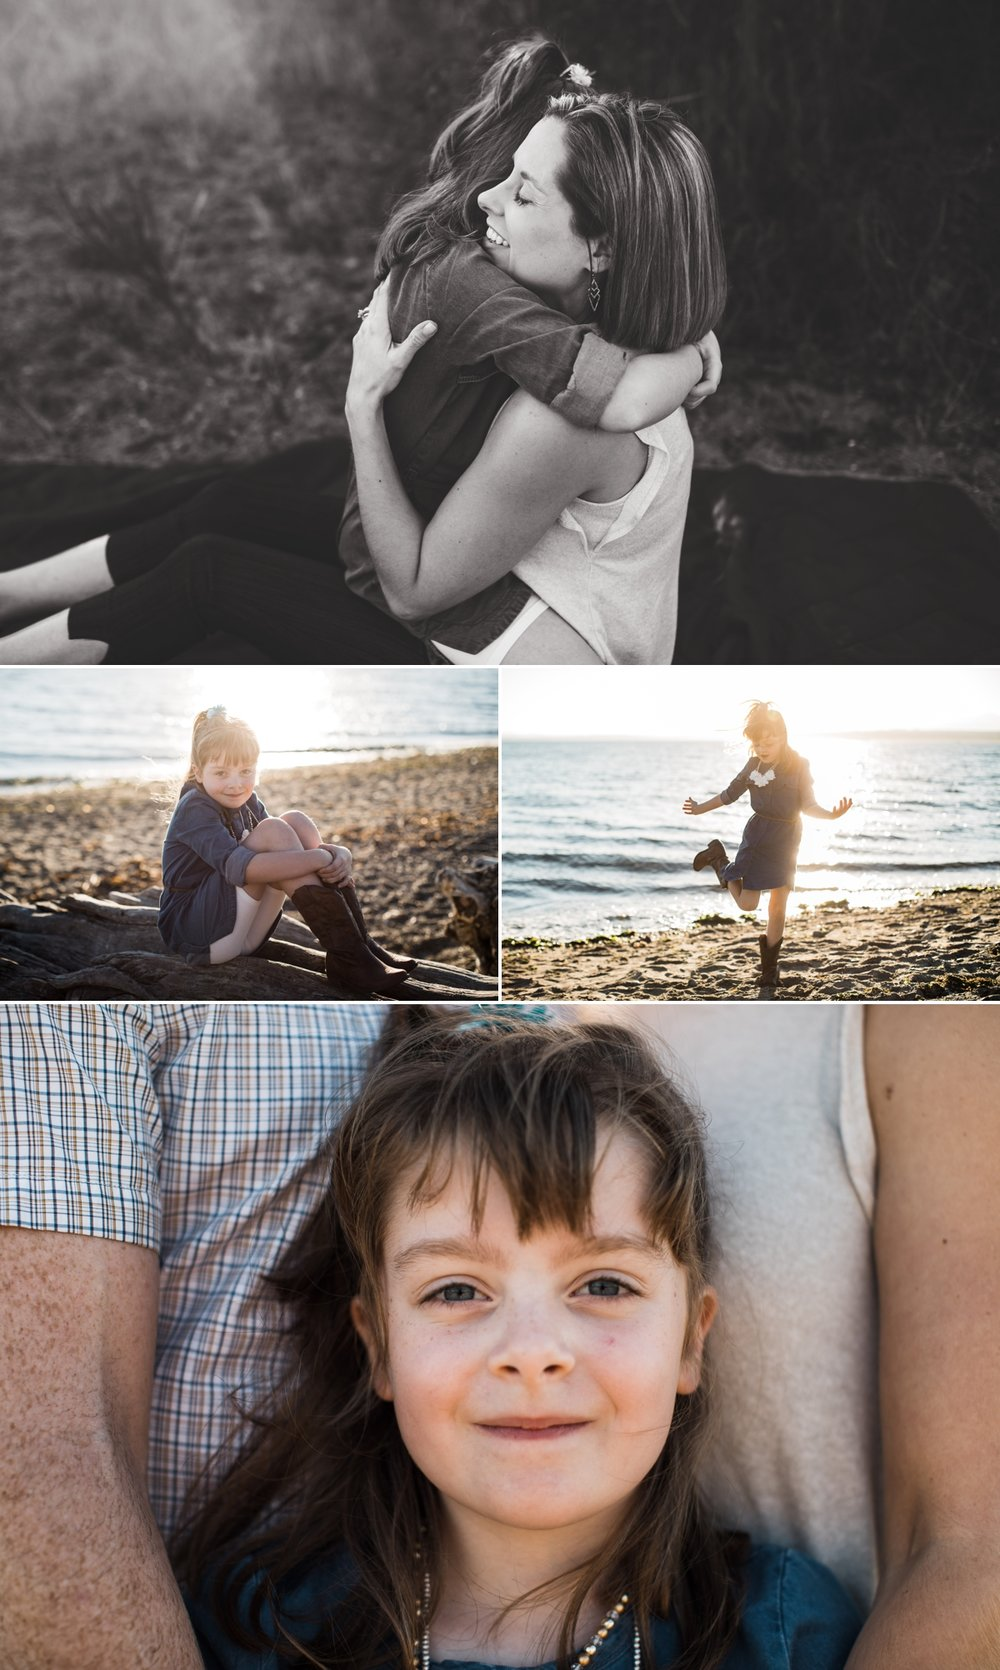 family photographer seattle beach lifestyle elena s blair photography 5.jpg